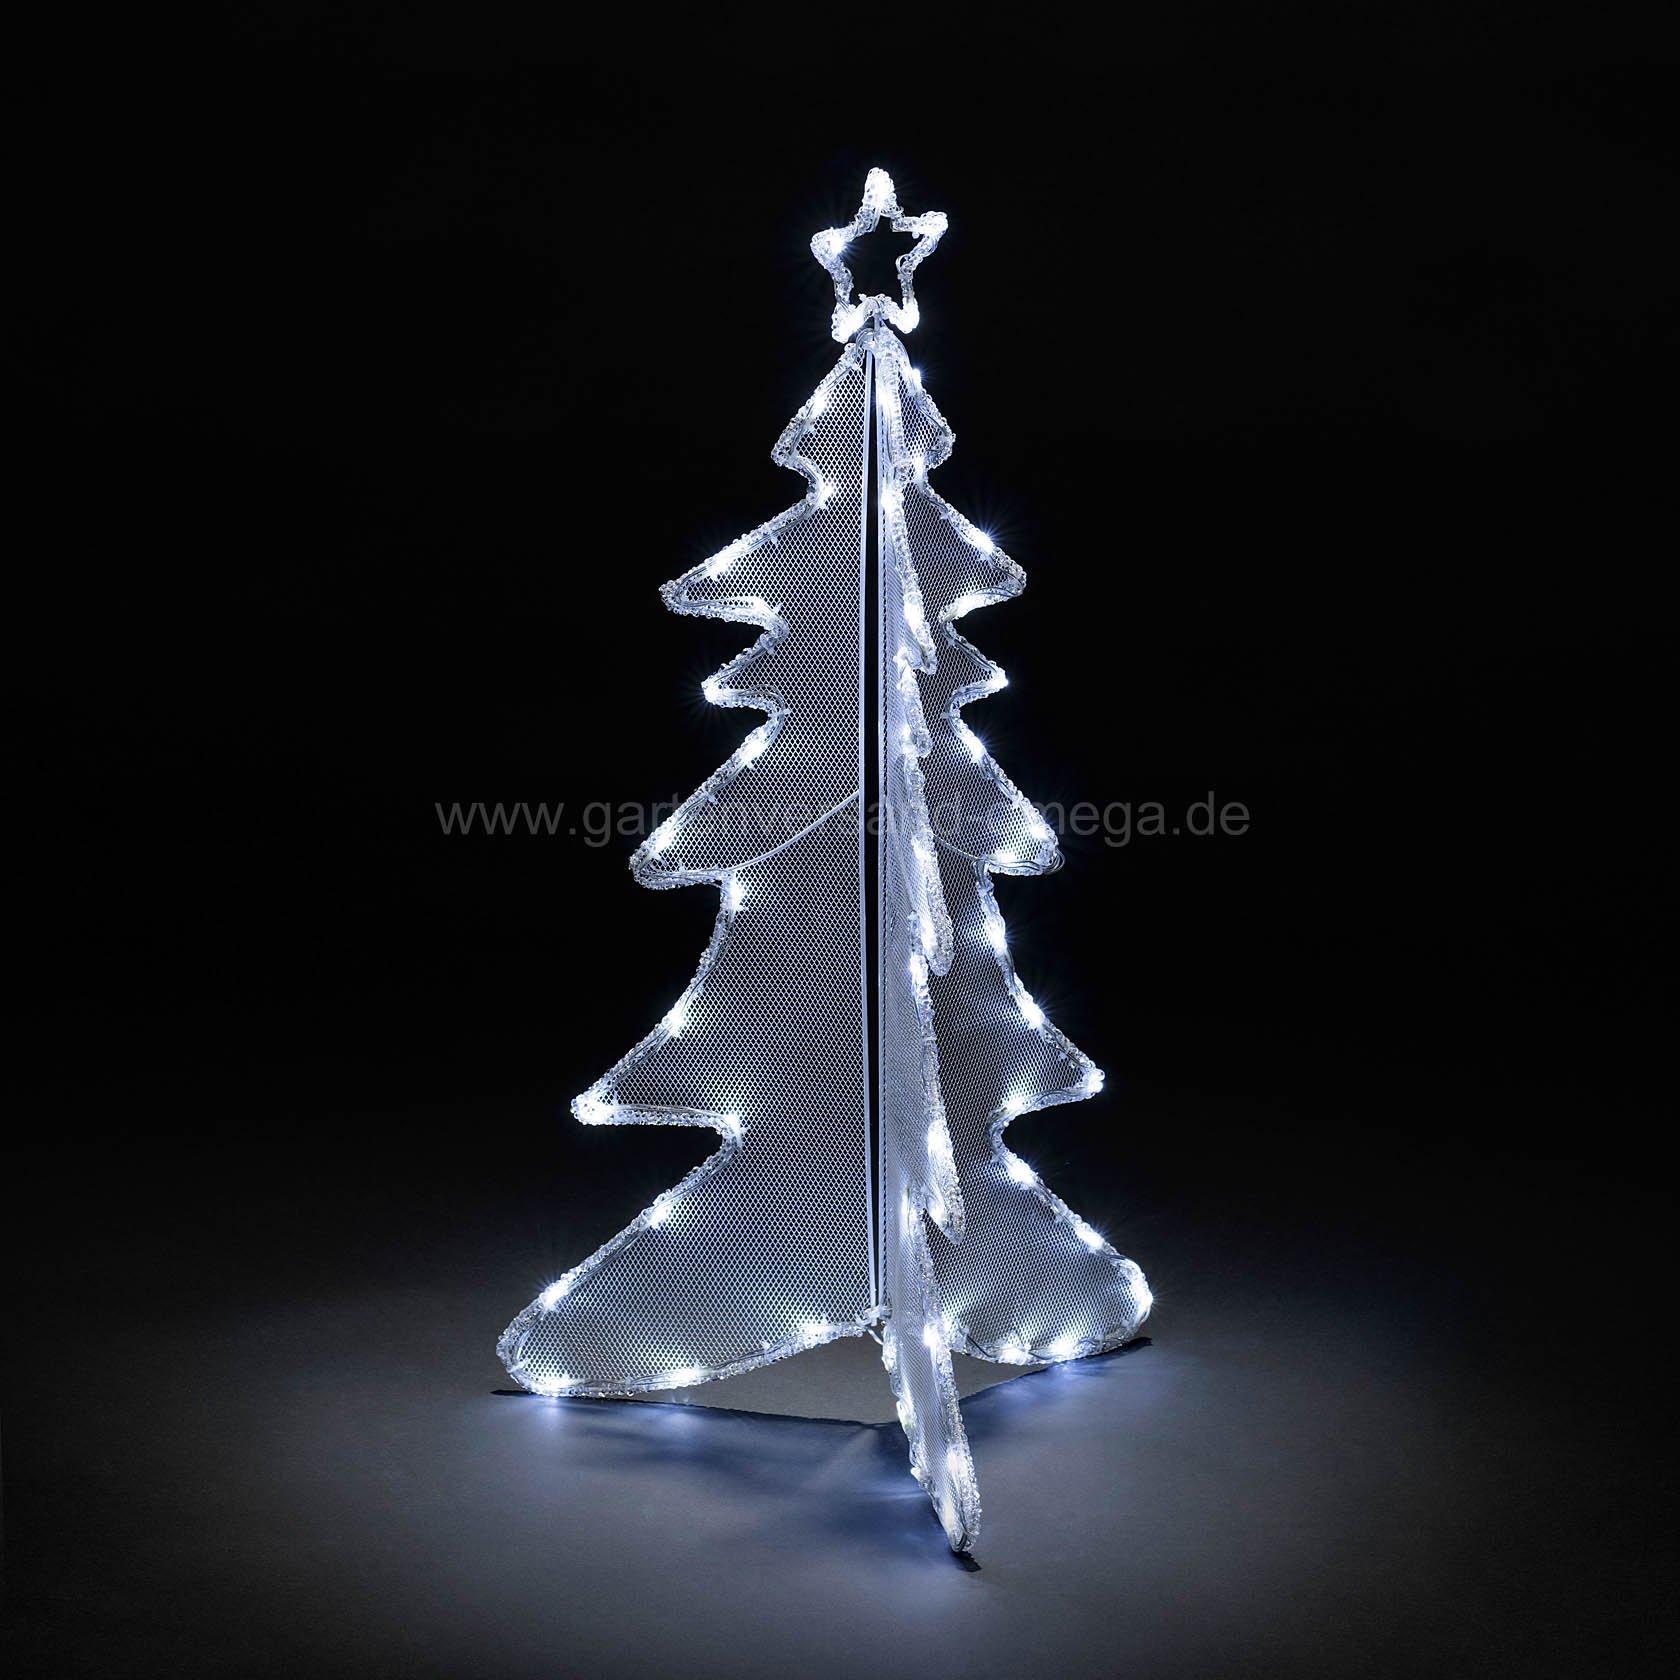 3d led acryl tannenbaum 90cm leuchtbaum beleuchteter - Beleuchteter tannenbaum kunststoff ...